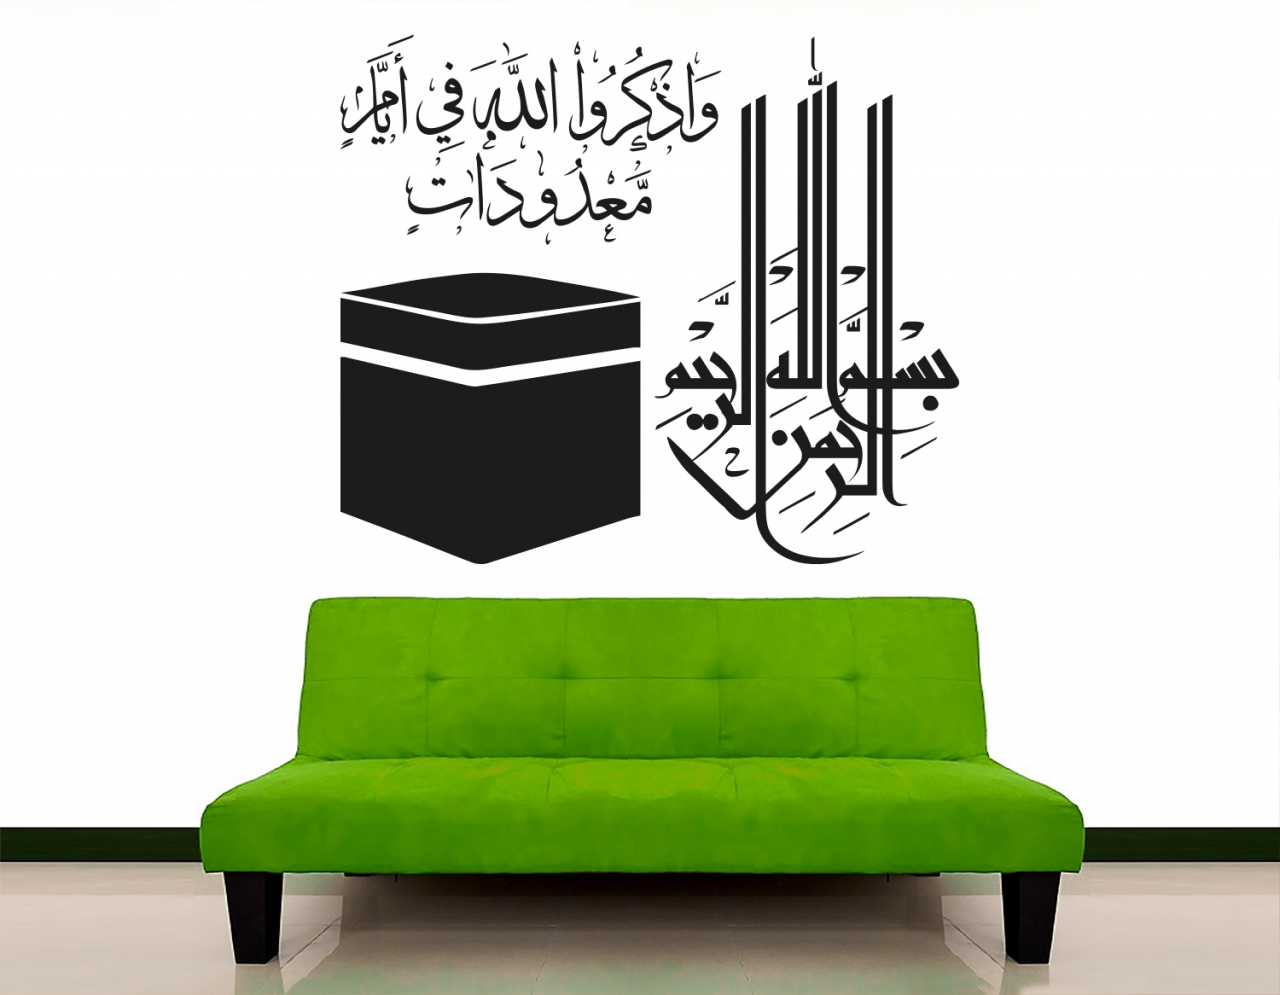 Kaaba Mekka Wandtattoo mit Koranvers verziert #1